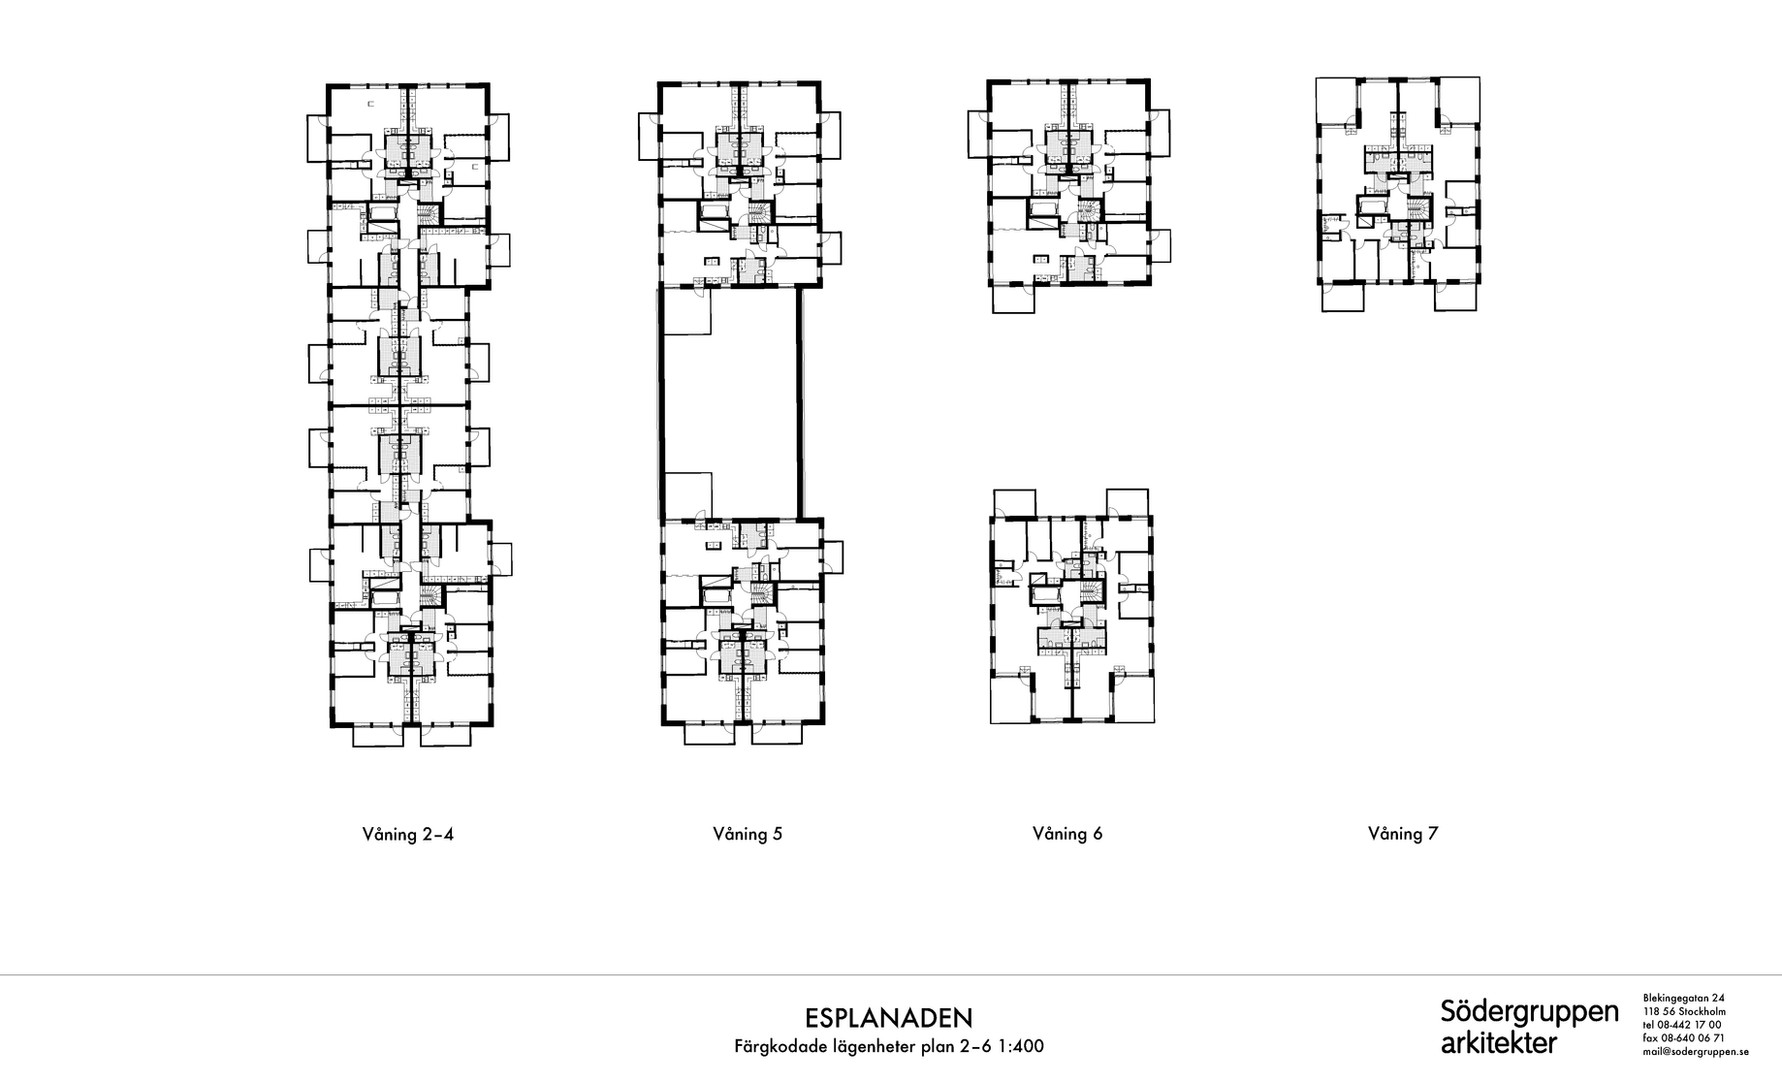 Plan våning 1-7